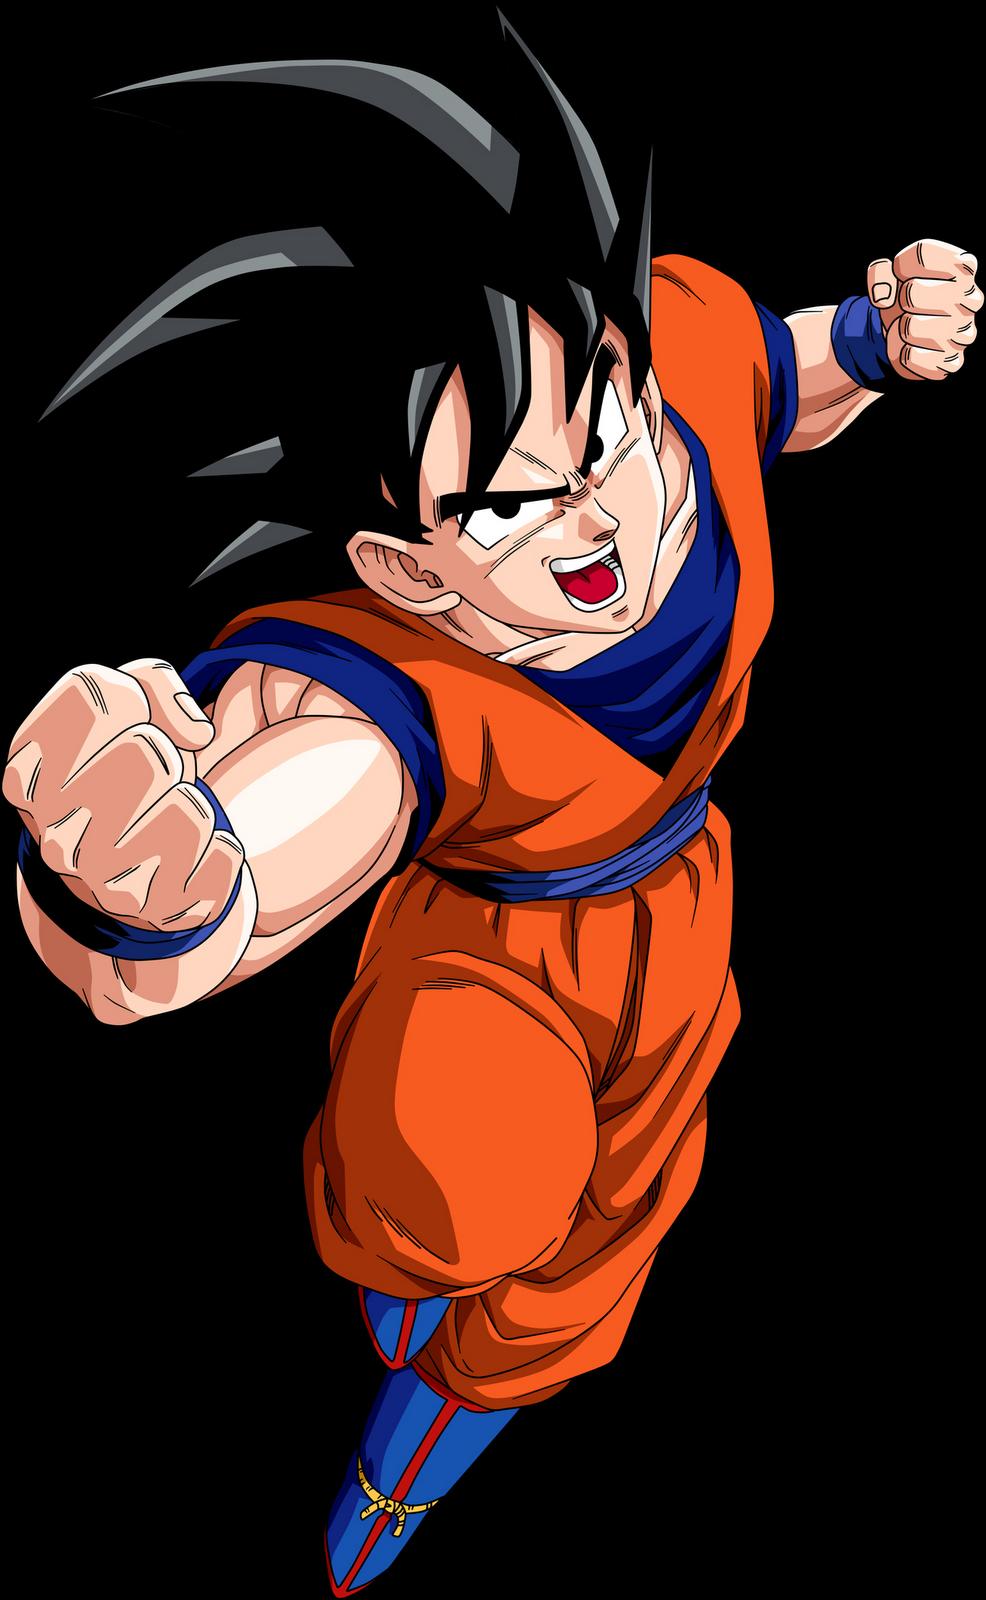 Goku heroes wiki fandom powered by wikia - San goku super saiyan 5 ...